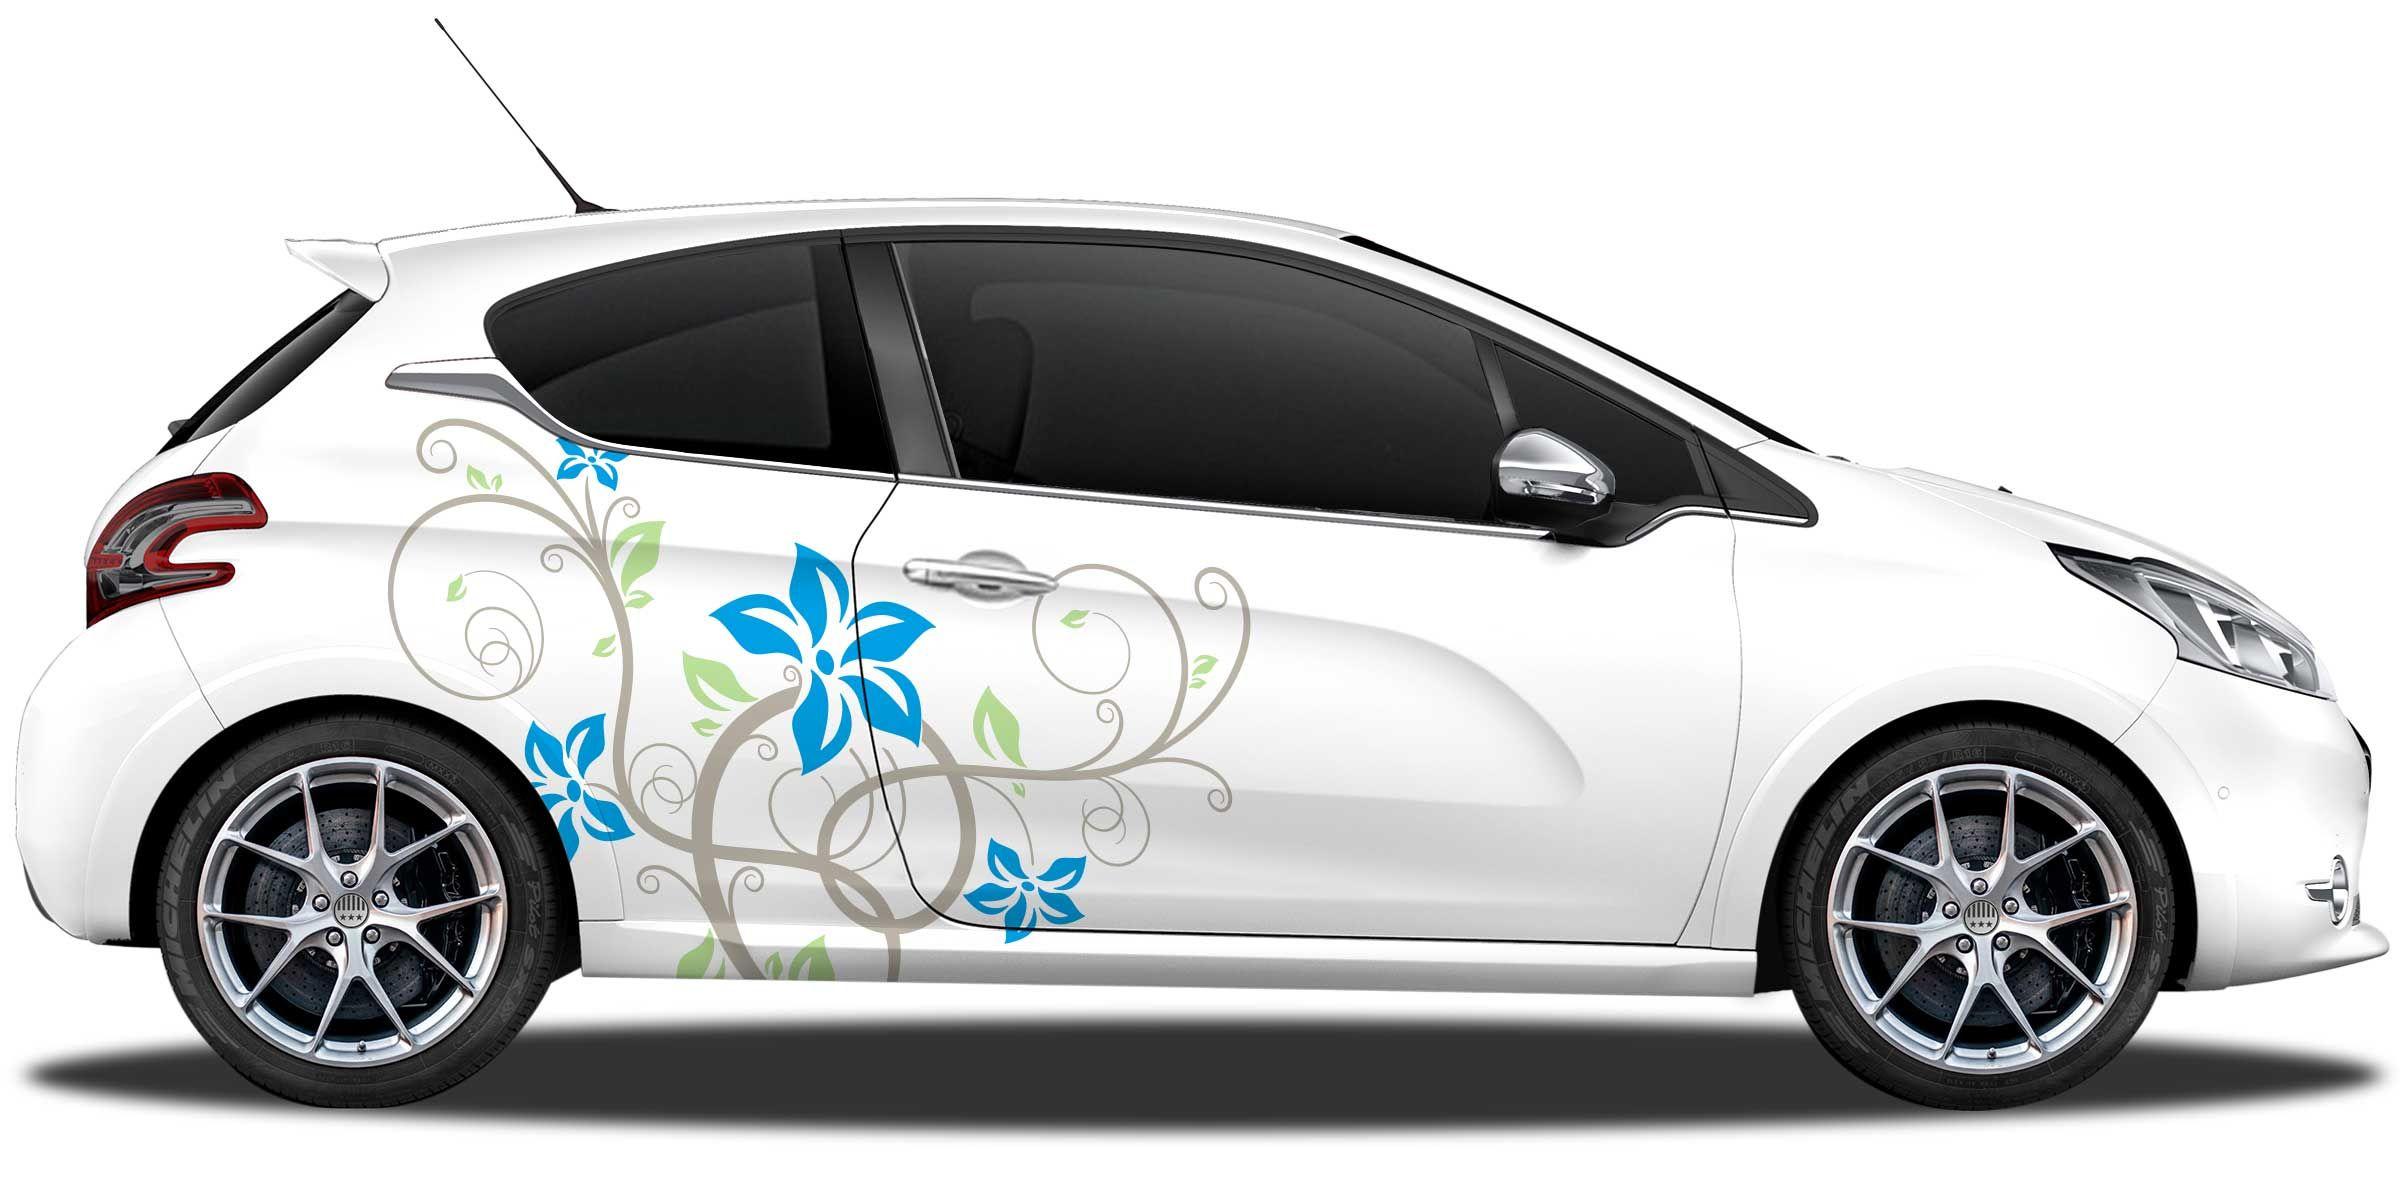 Autoaufkleber Blumenornament Pinterest